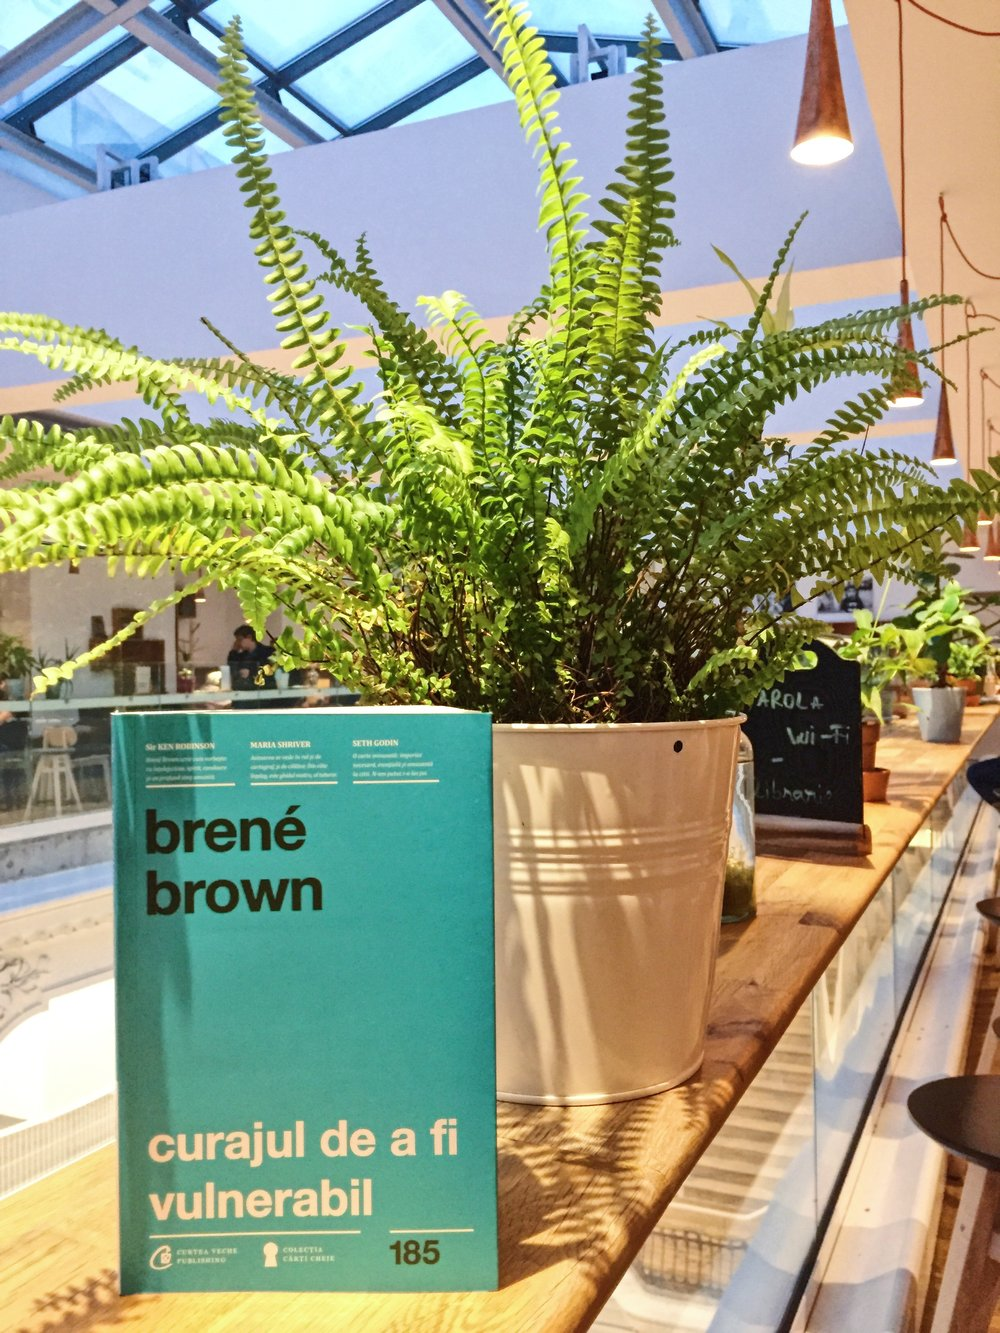 Brene+Brown+Vulnerabilitate+Carturesti+Yoga+City.jpeg